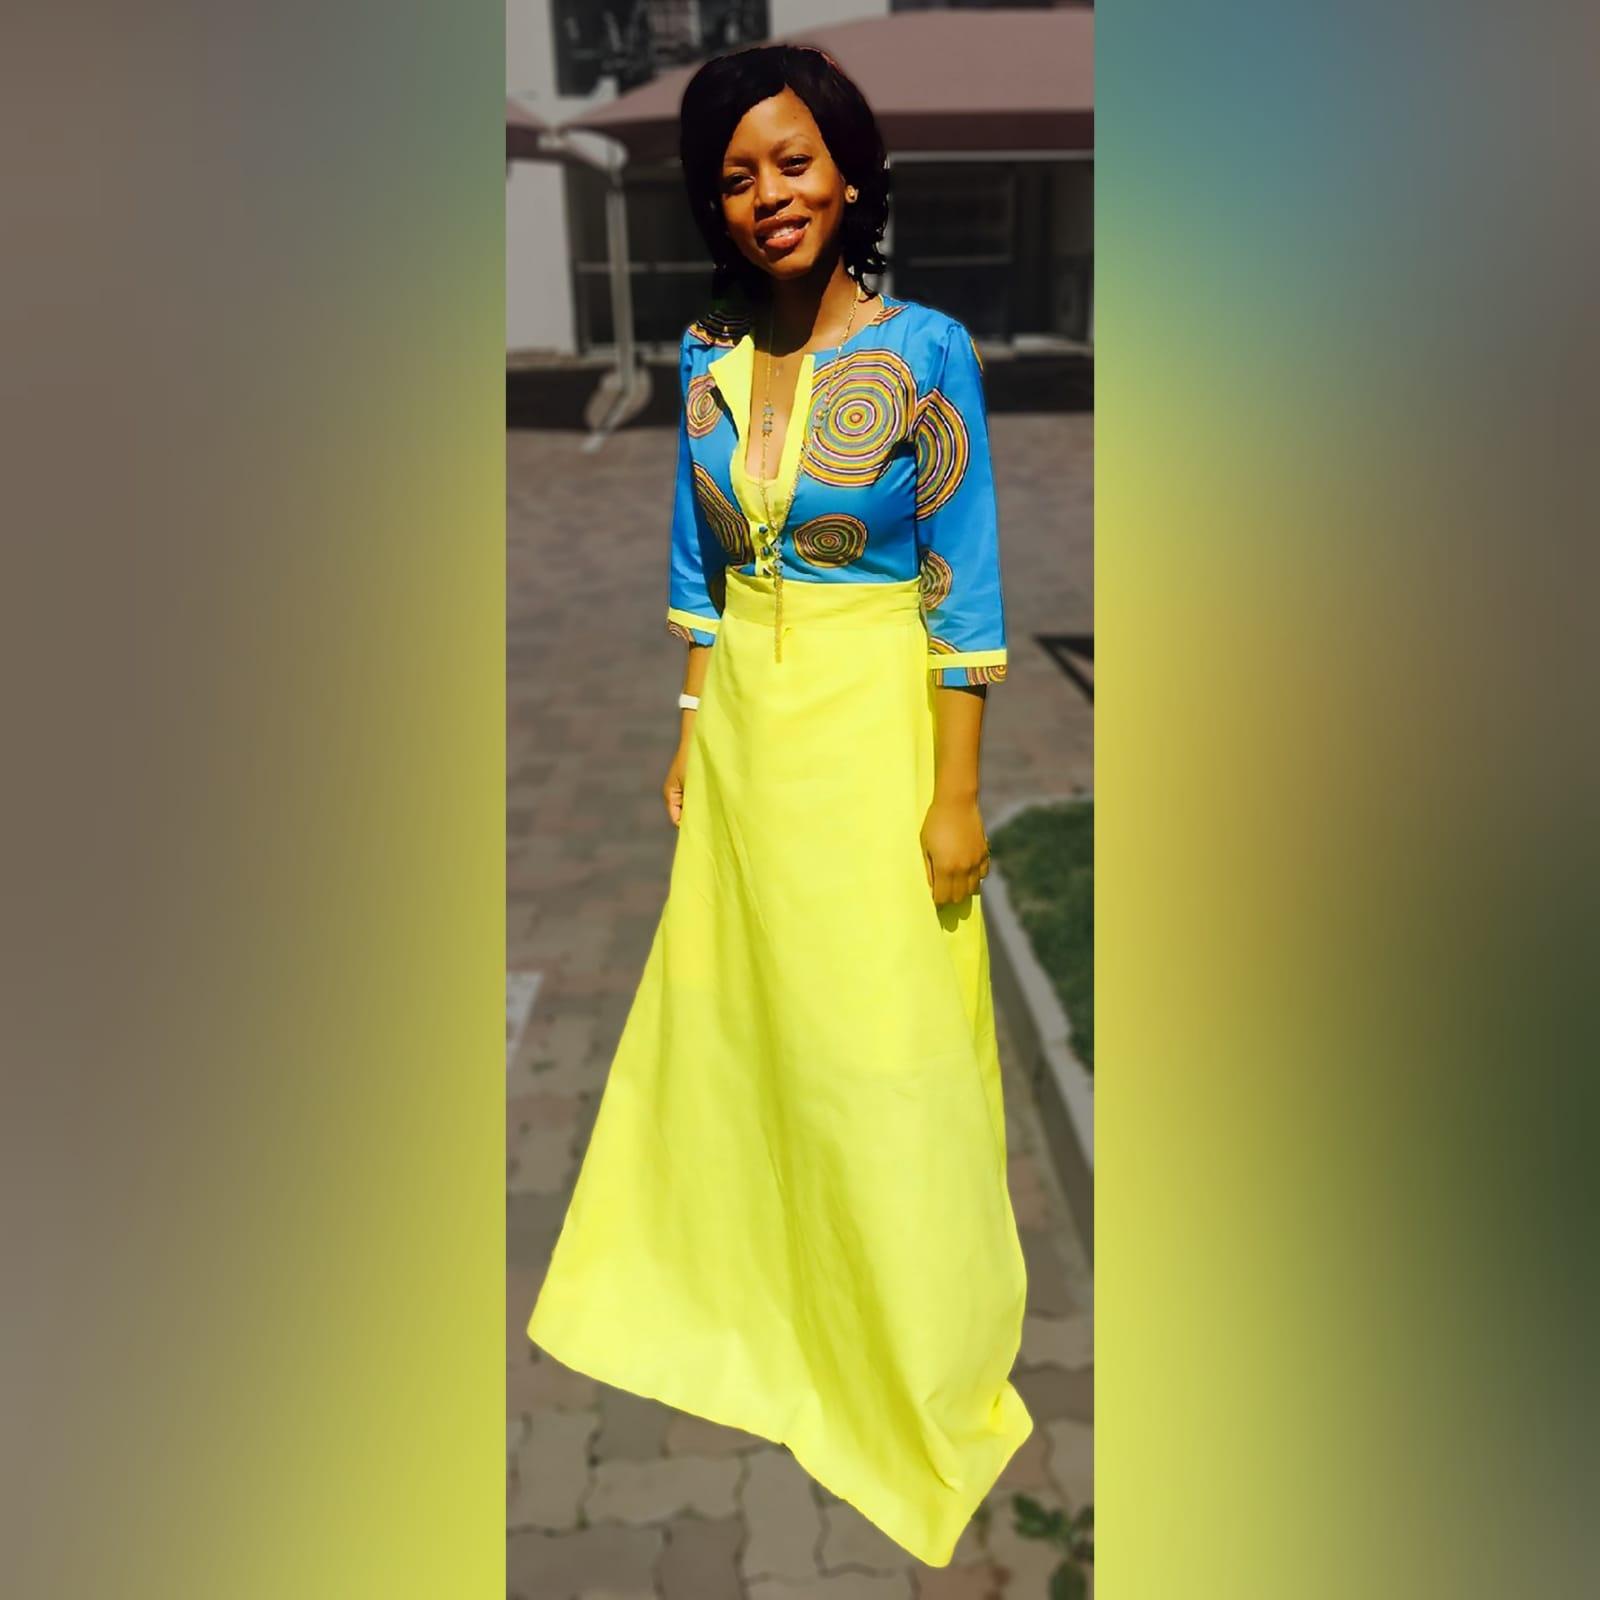 Blue & yellow modern traditional dress 5 modern traditional blue and yellow empire fit dress. Flowy bottom, neckline with a slit.